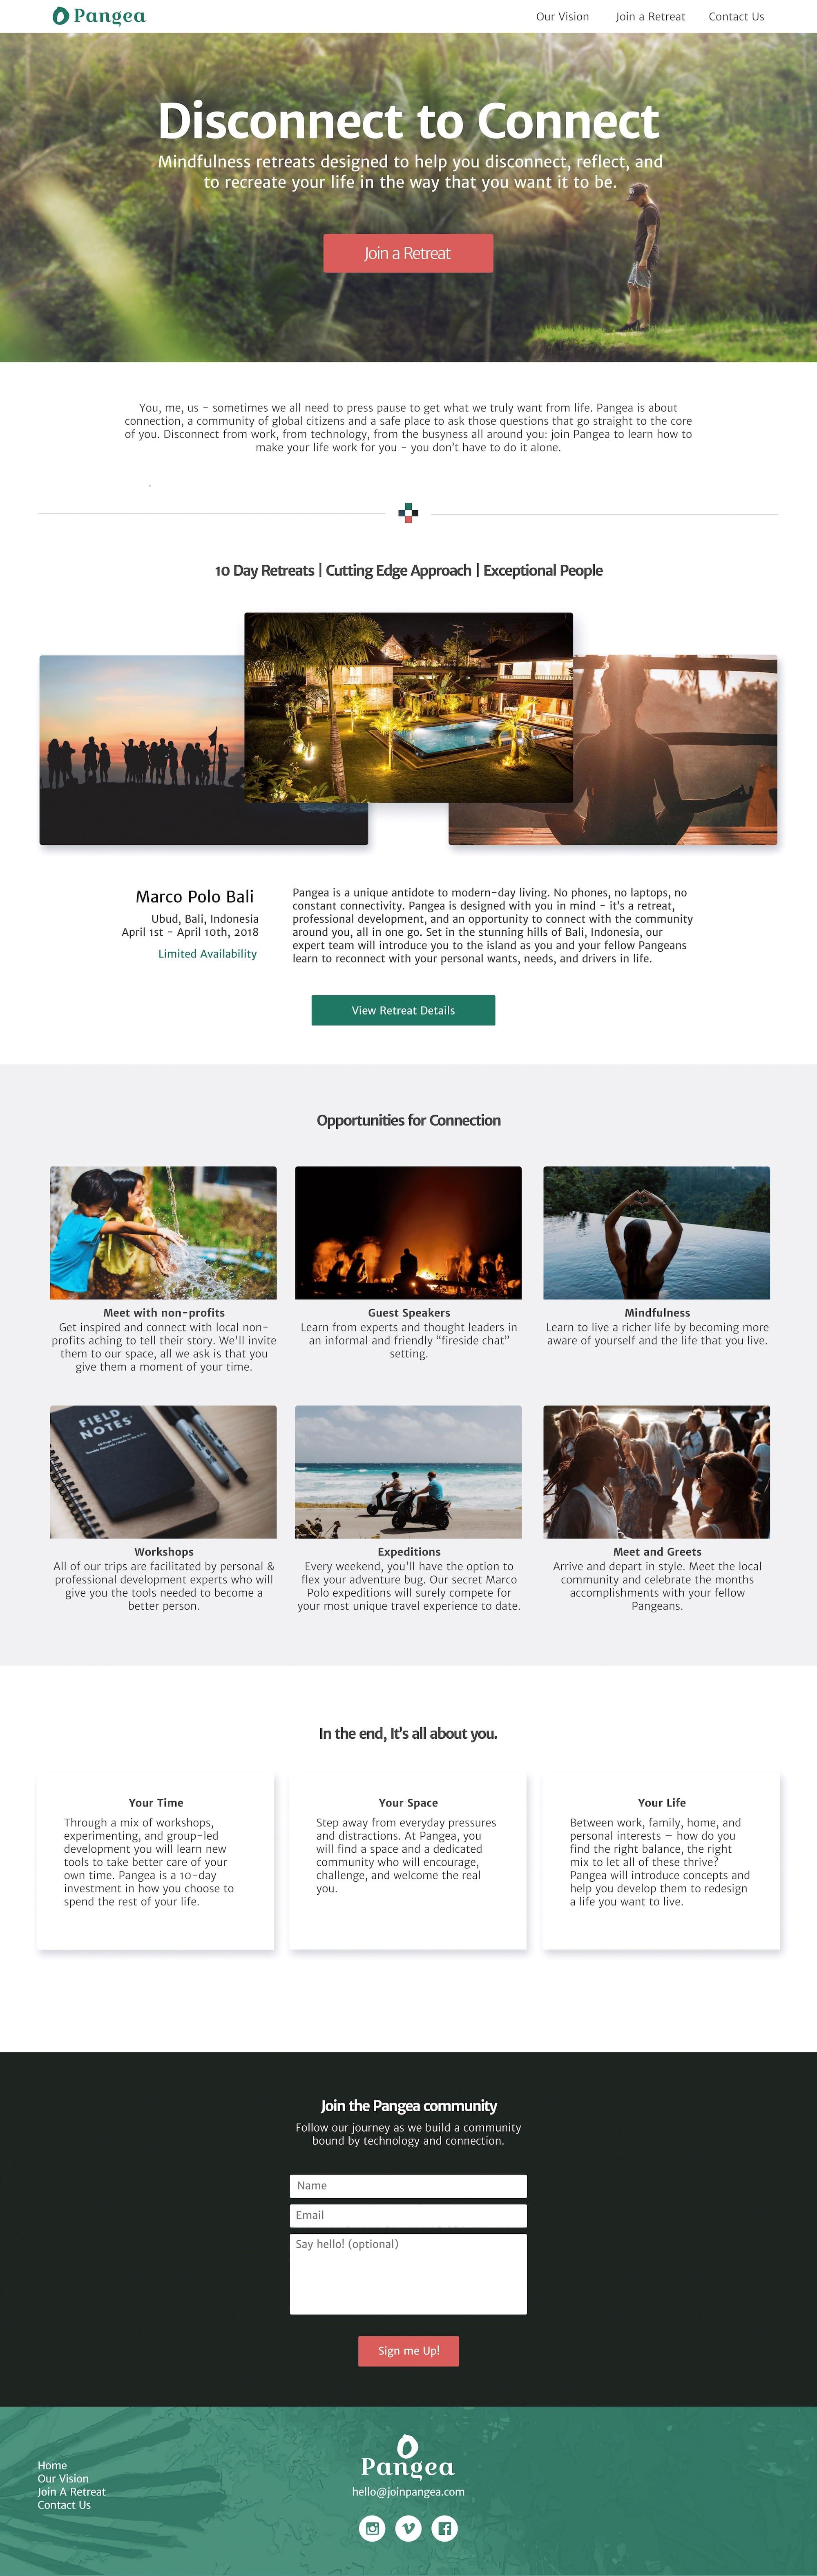 Sample design for pangea retreats website